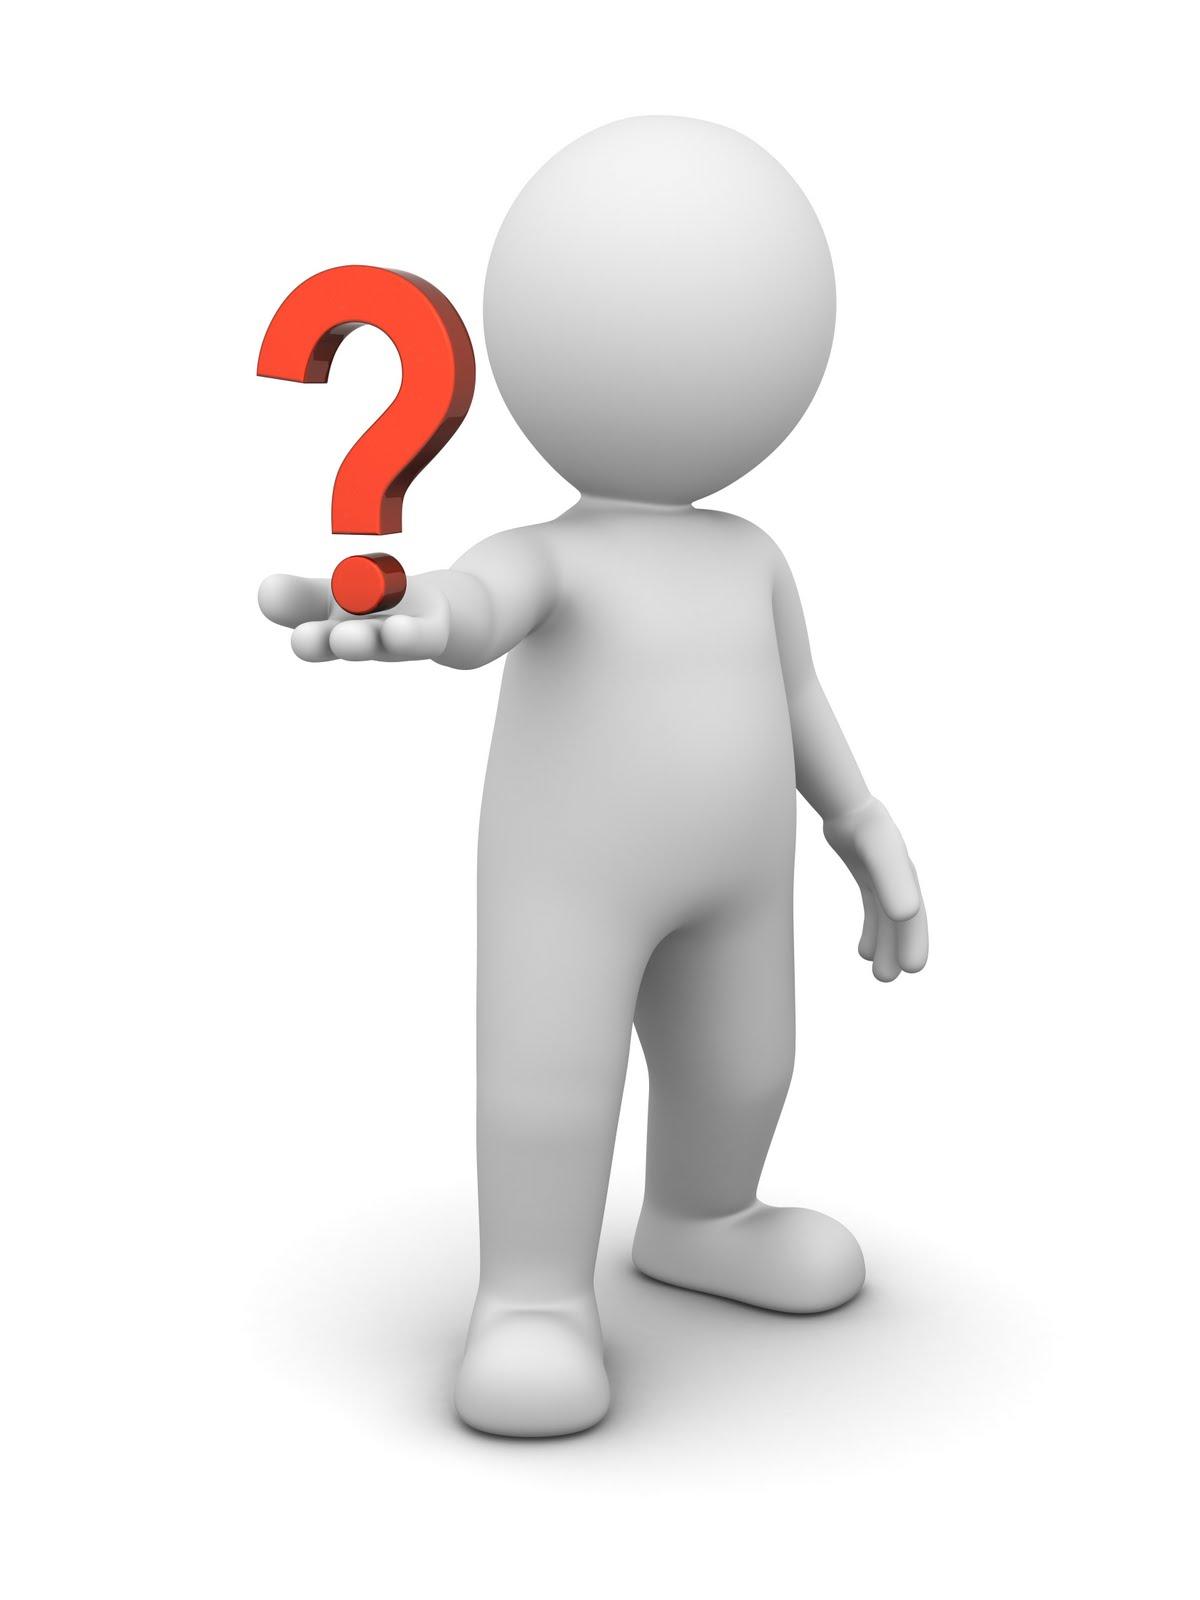 Renunciar a una herència o acceptar a benefici d'inventari